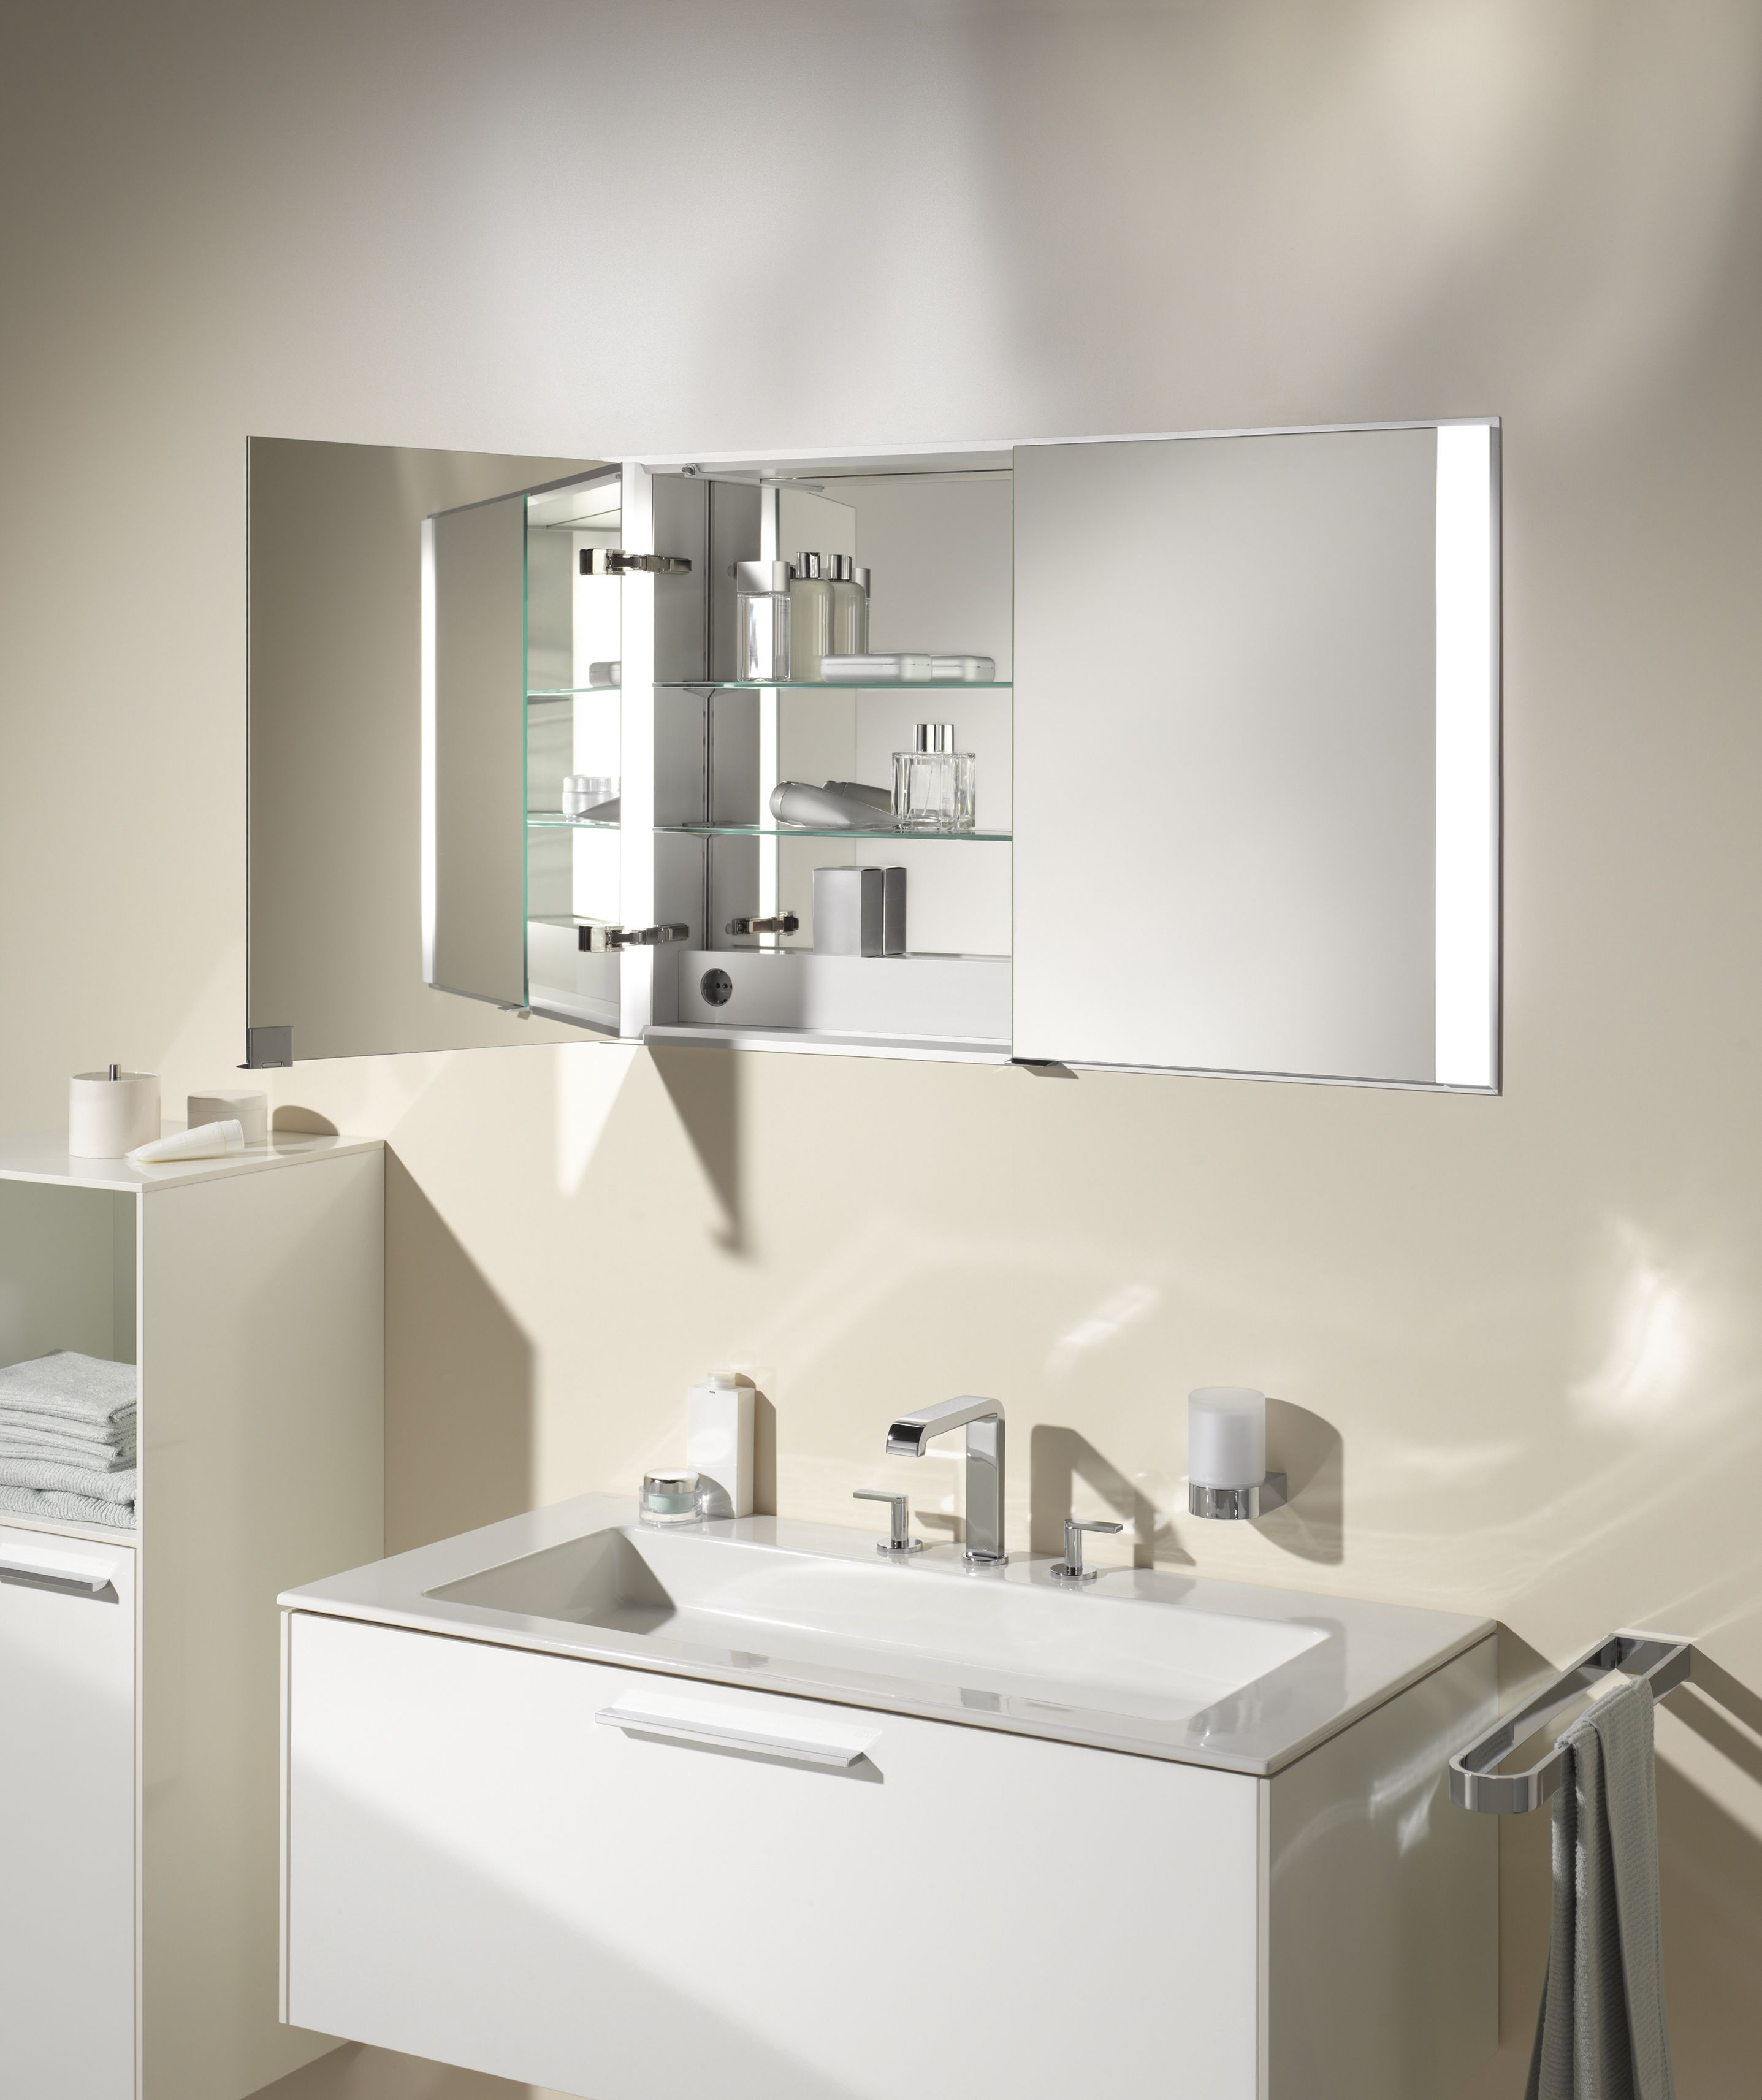 Keuco Royal 60 Bathroomfurniture Architecture Design Badezimmer Schrank Badezimmer Schrank Tipps